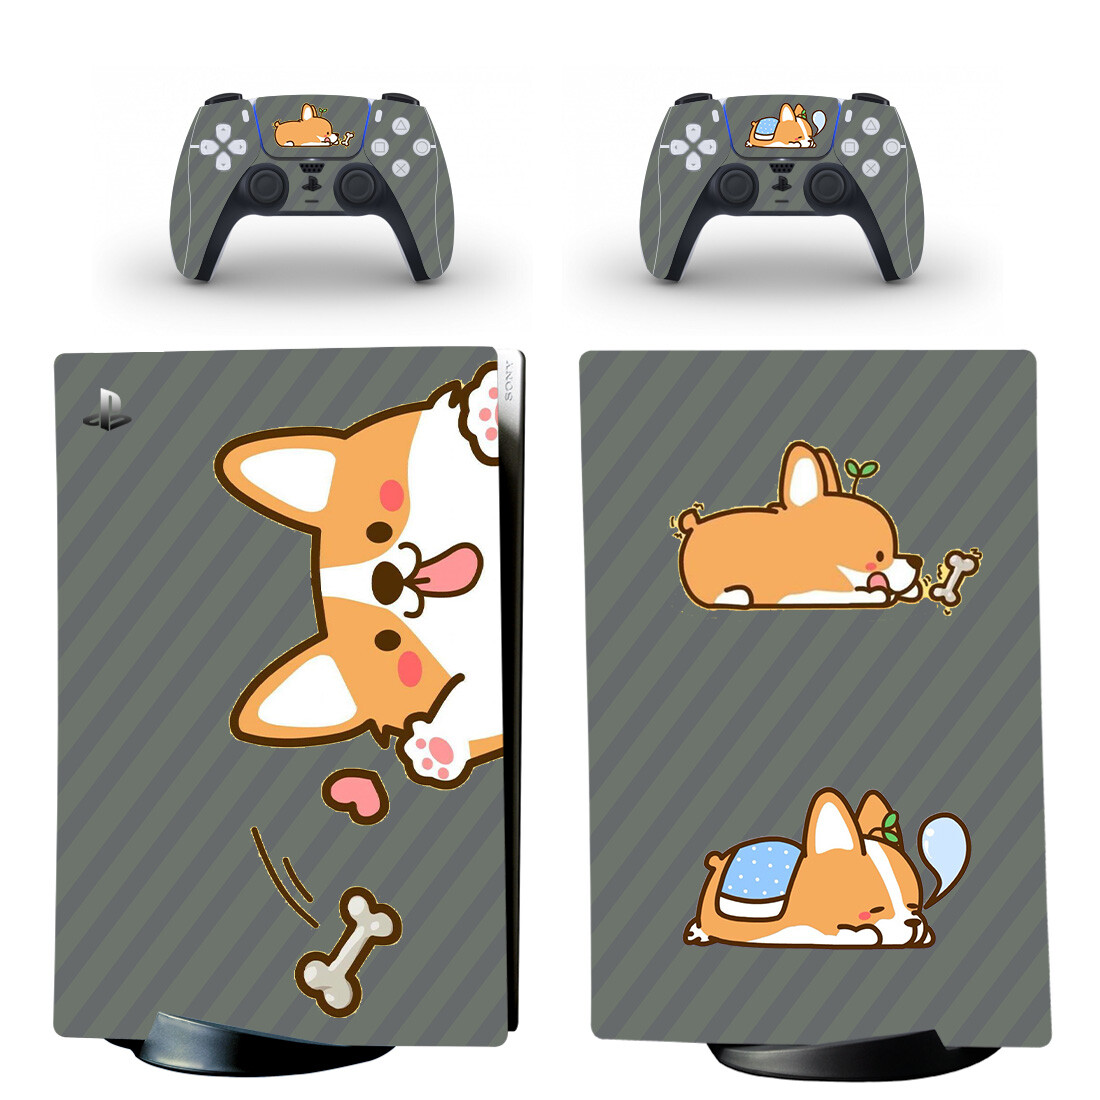 Shiba Inu Cartoon Dog PS5 Digital Edition Skin Sticker Decal Design 3